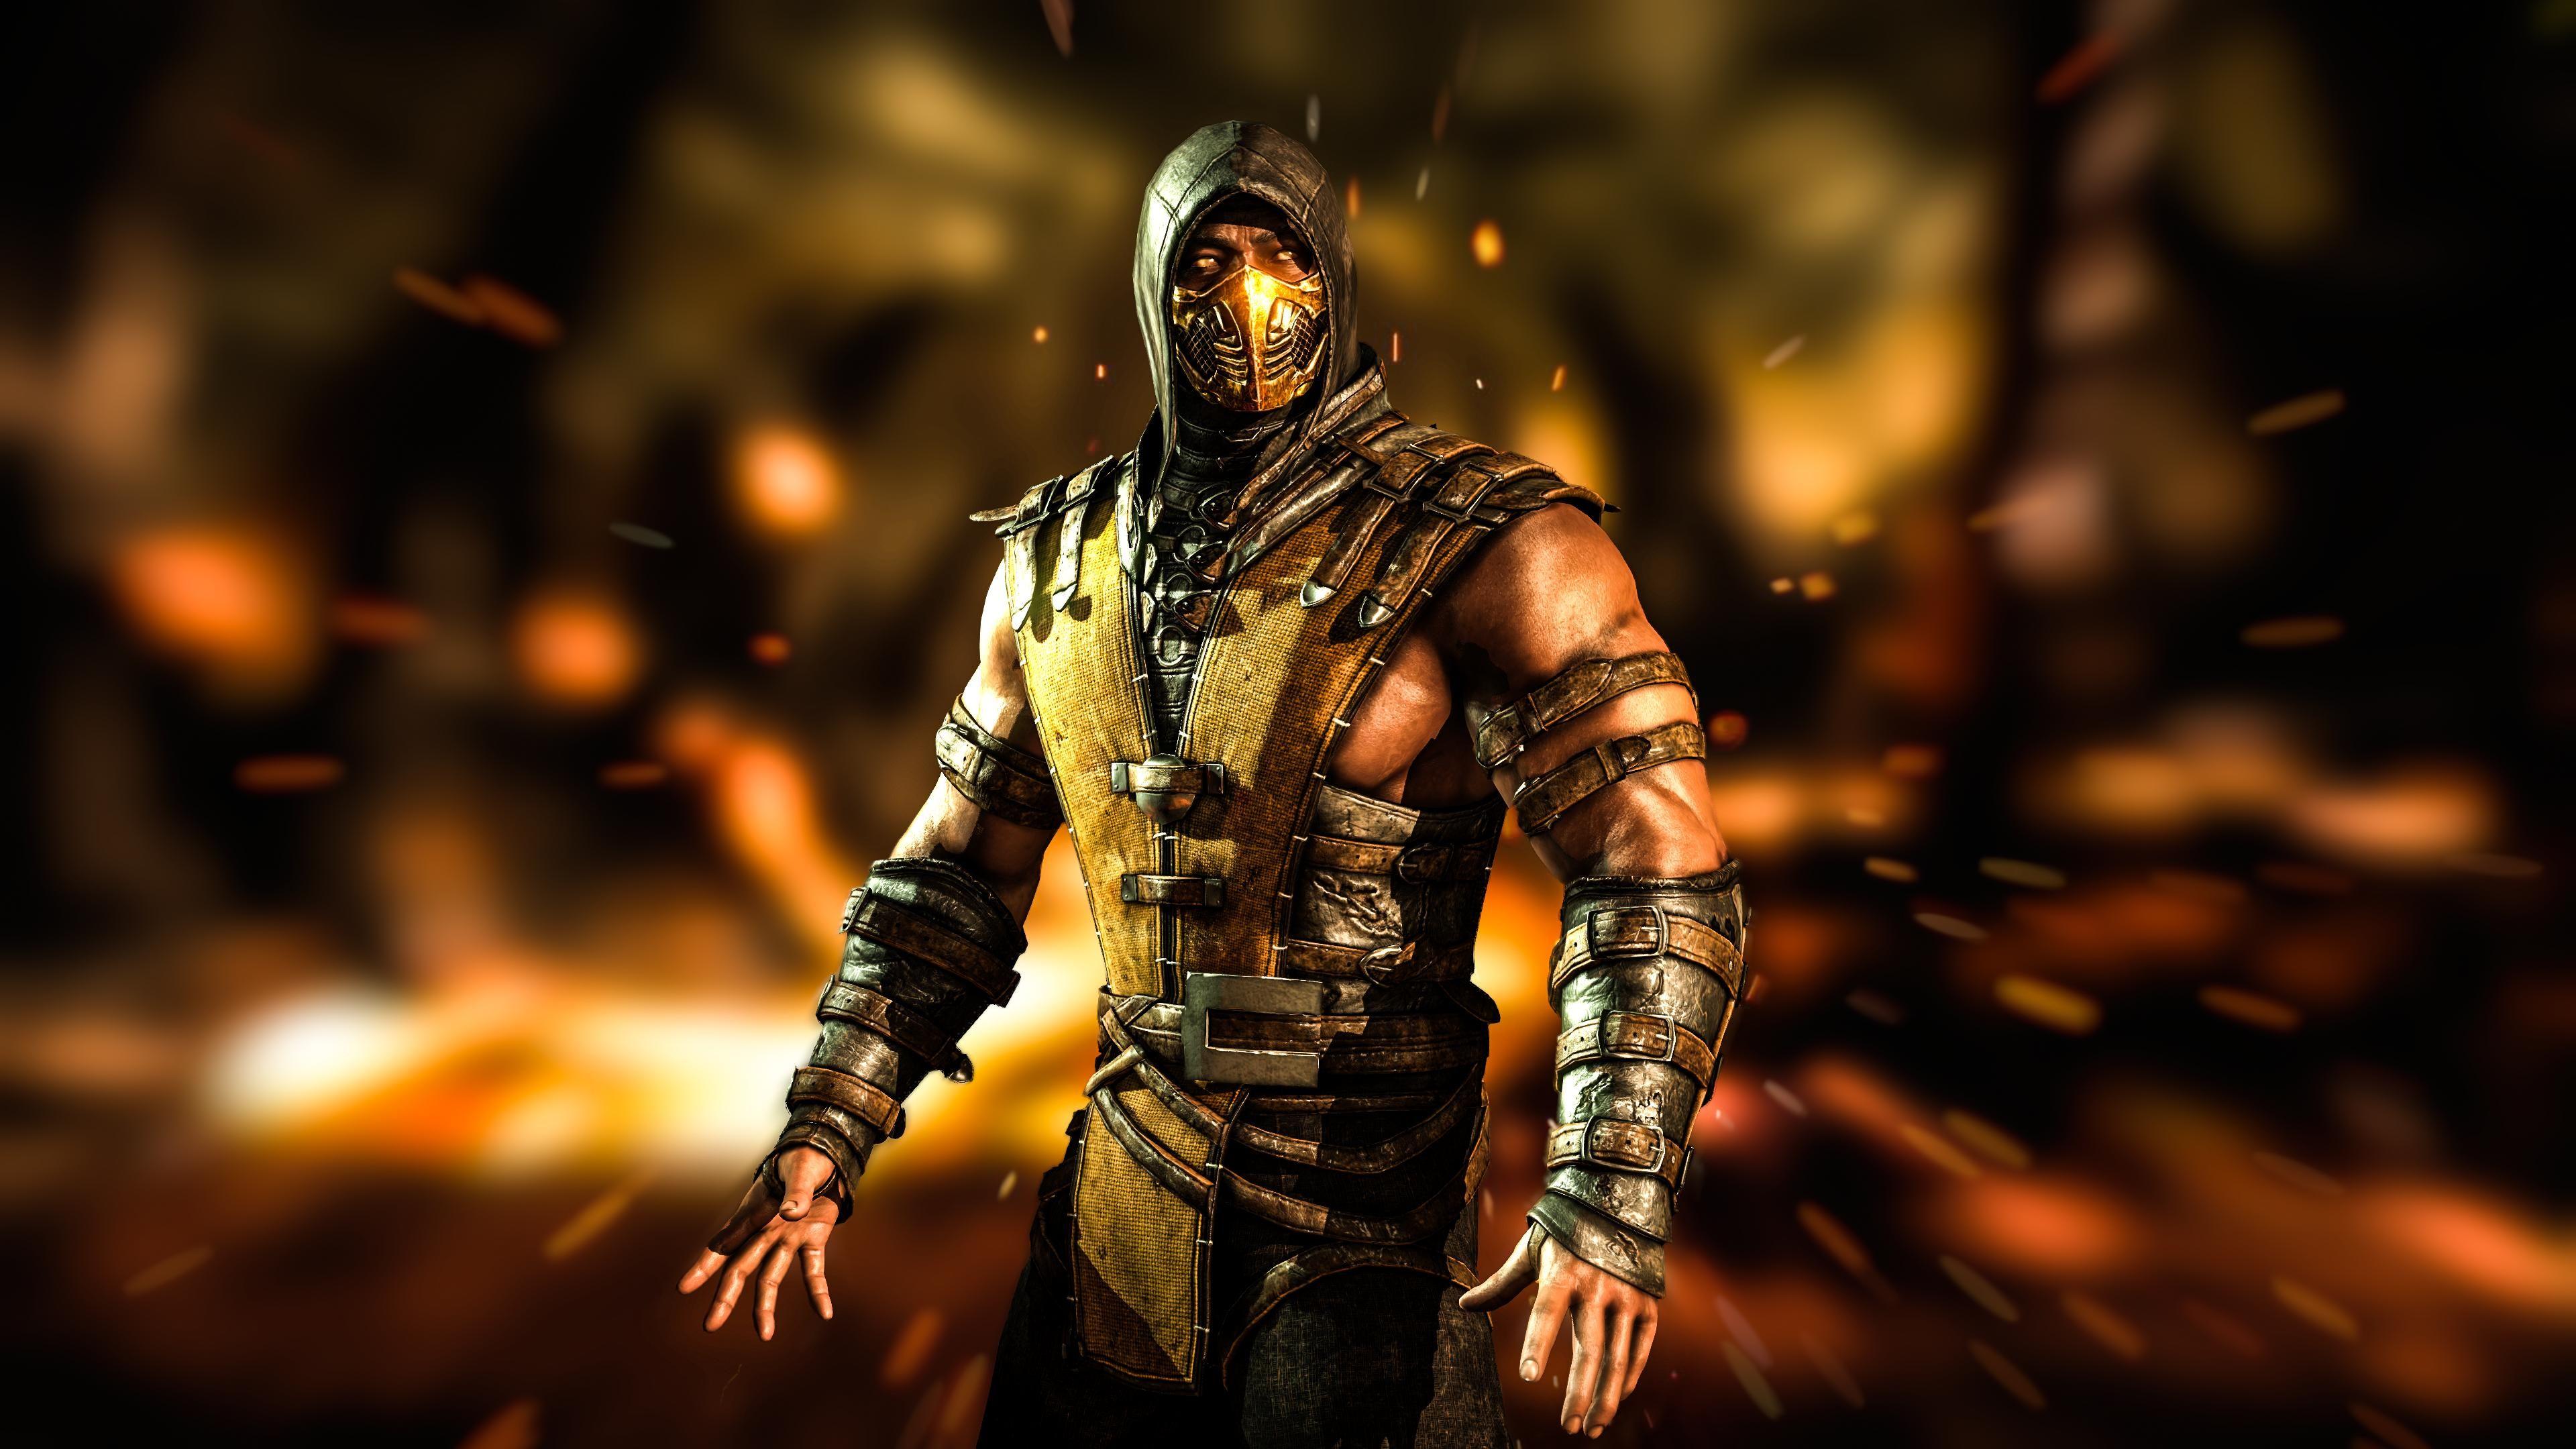 Mortal Kombat X Wallpaper Hd Mortal Kombat Dc Universe Marvel